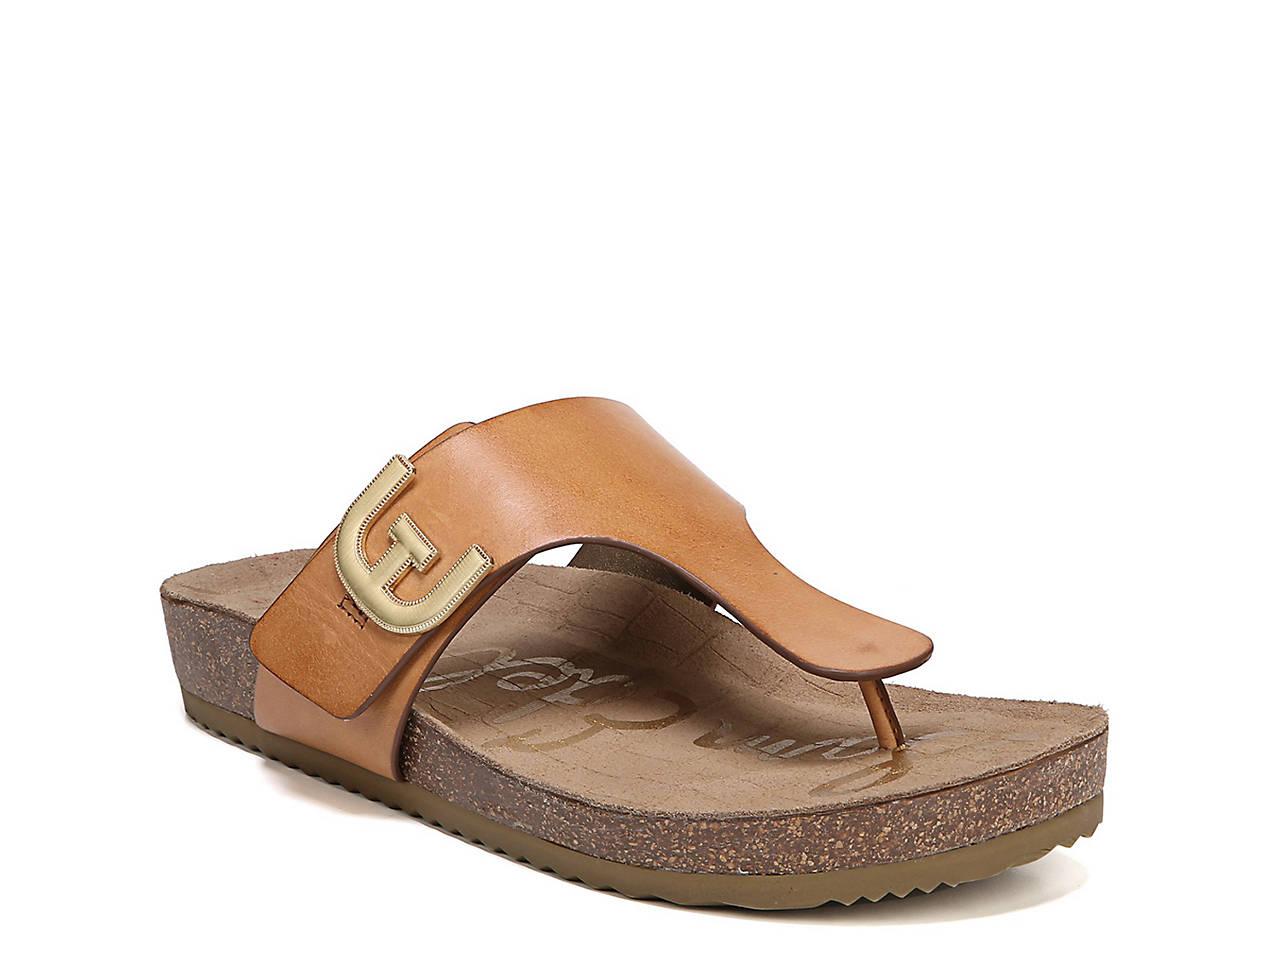 a35a0c708f55 Sam Edelman Olga Wedge Sandal Women s Shoes